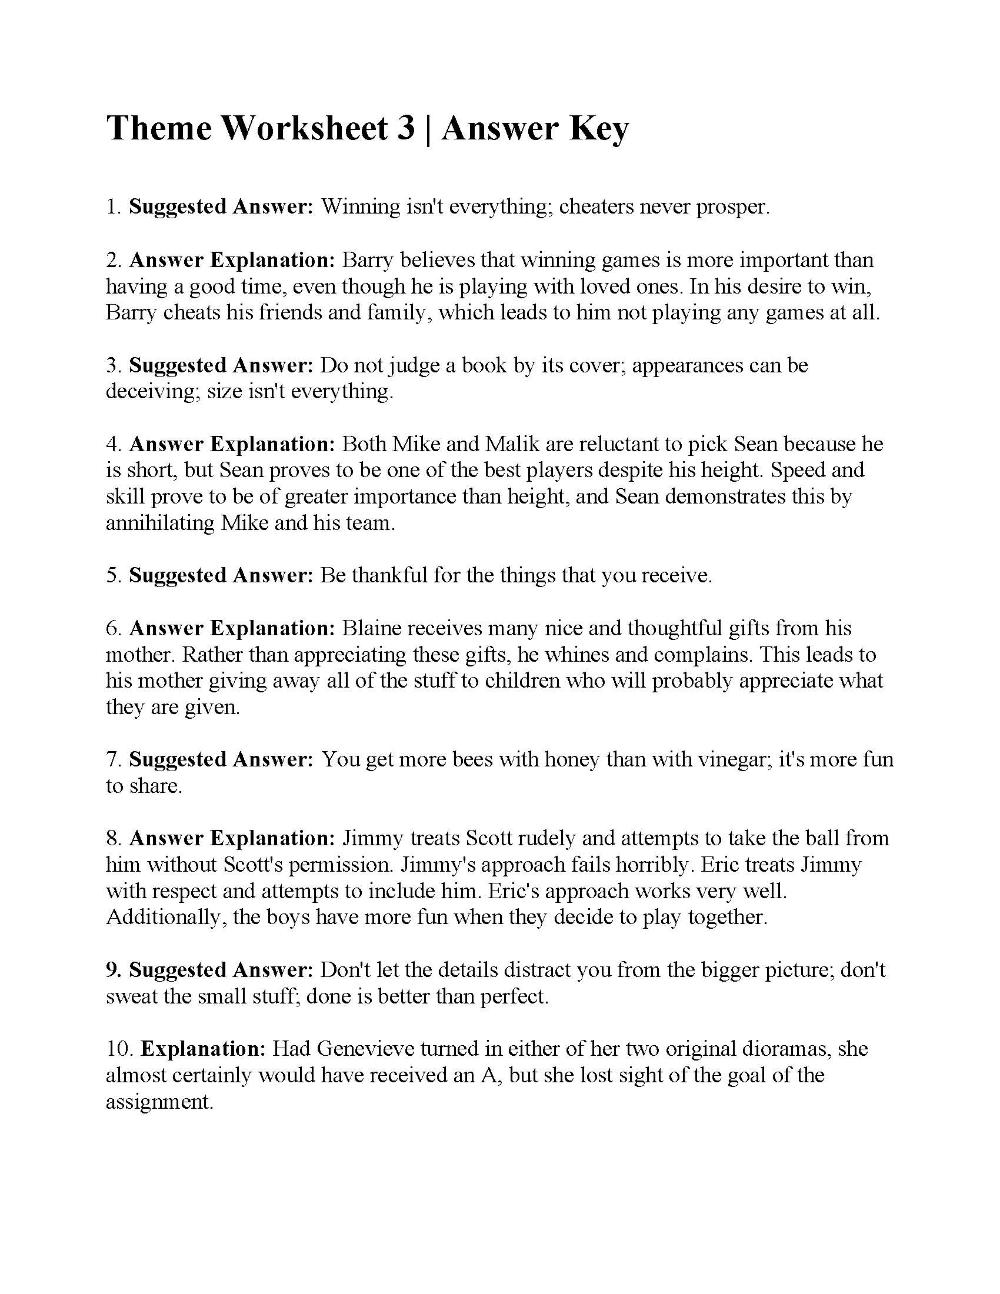 Theme Worksheet 3 | Answers | desktop | Worksheets, Reading ...